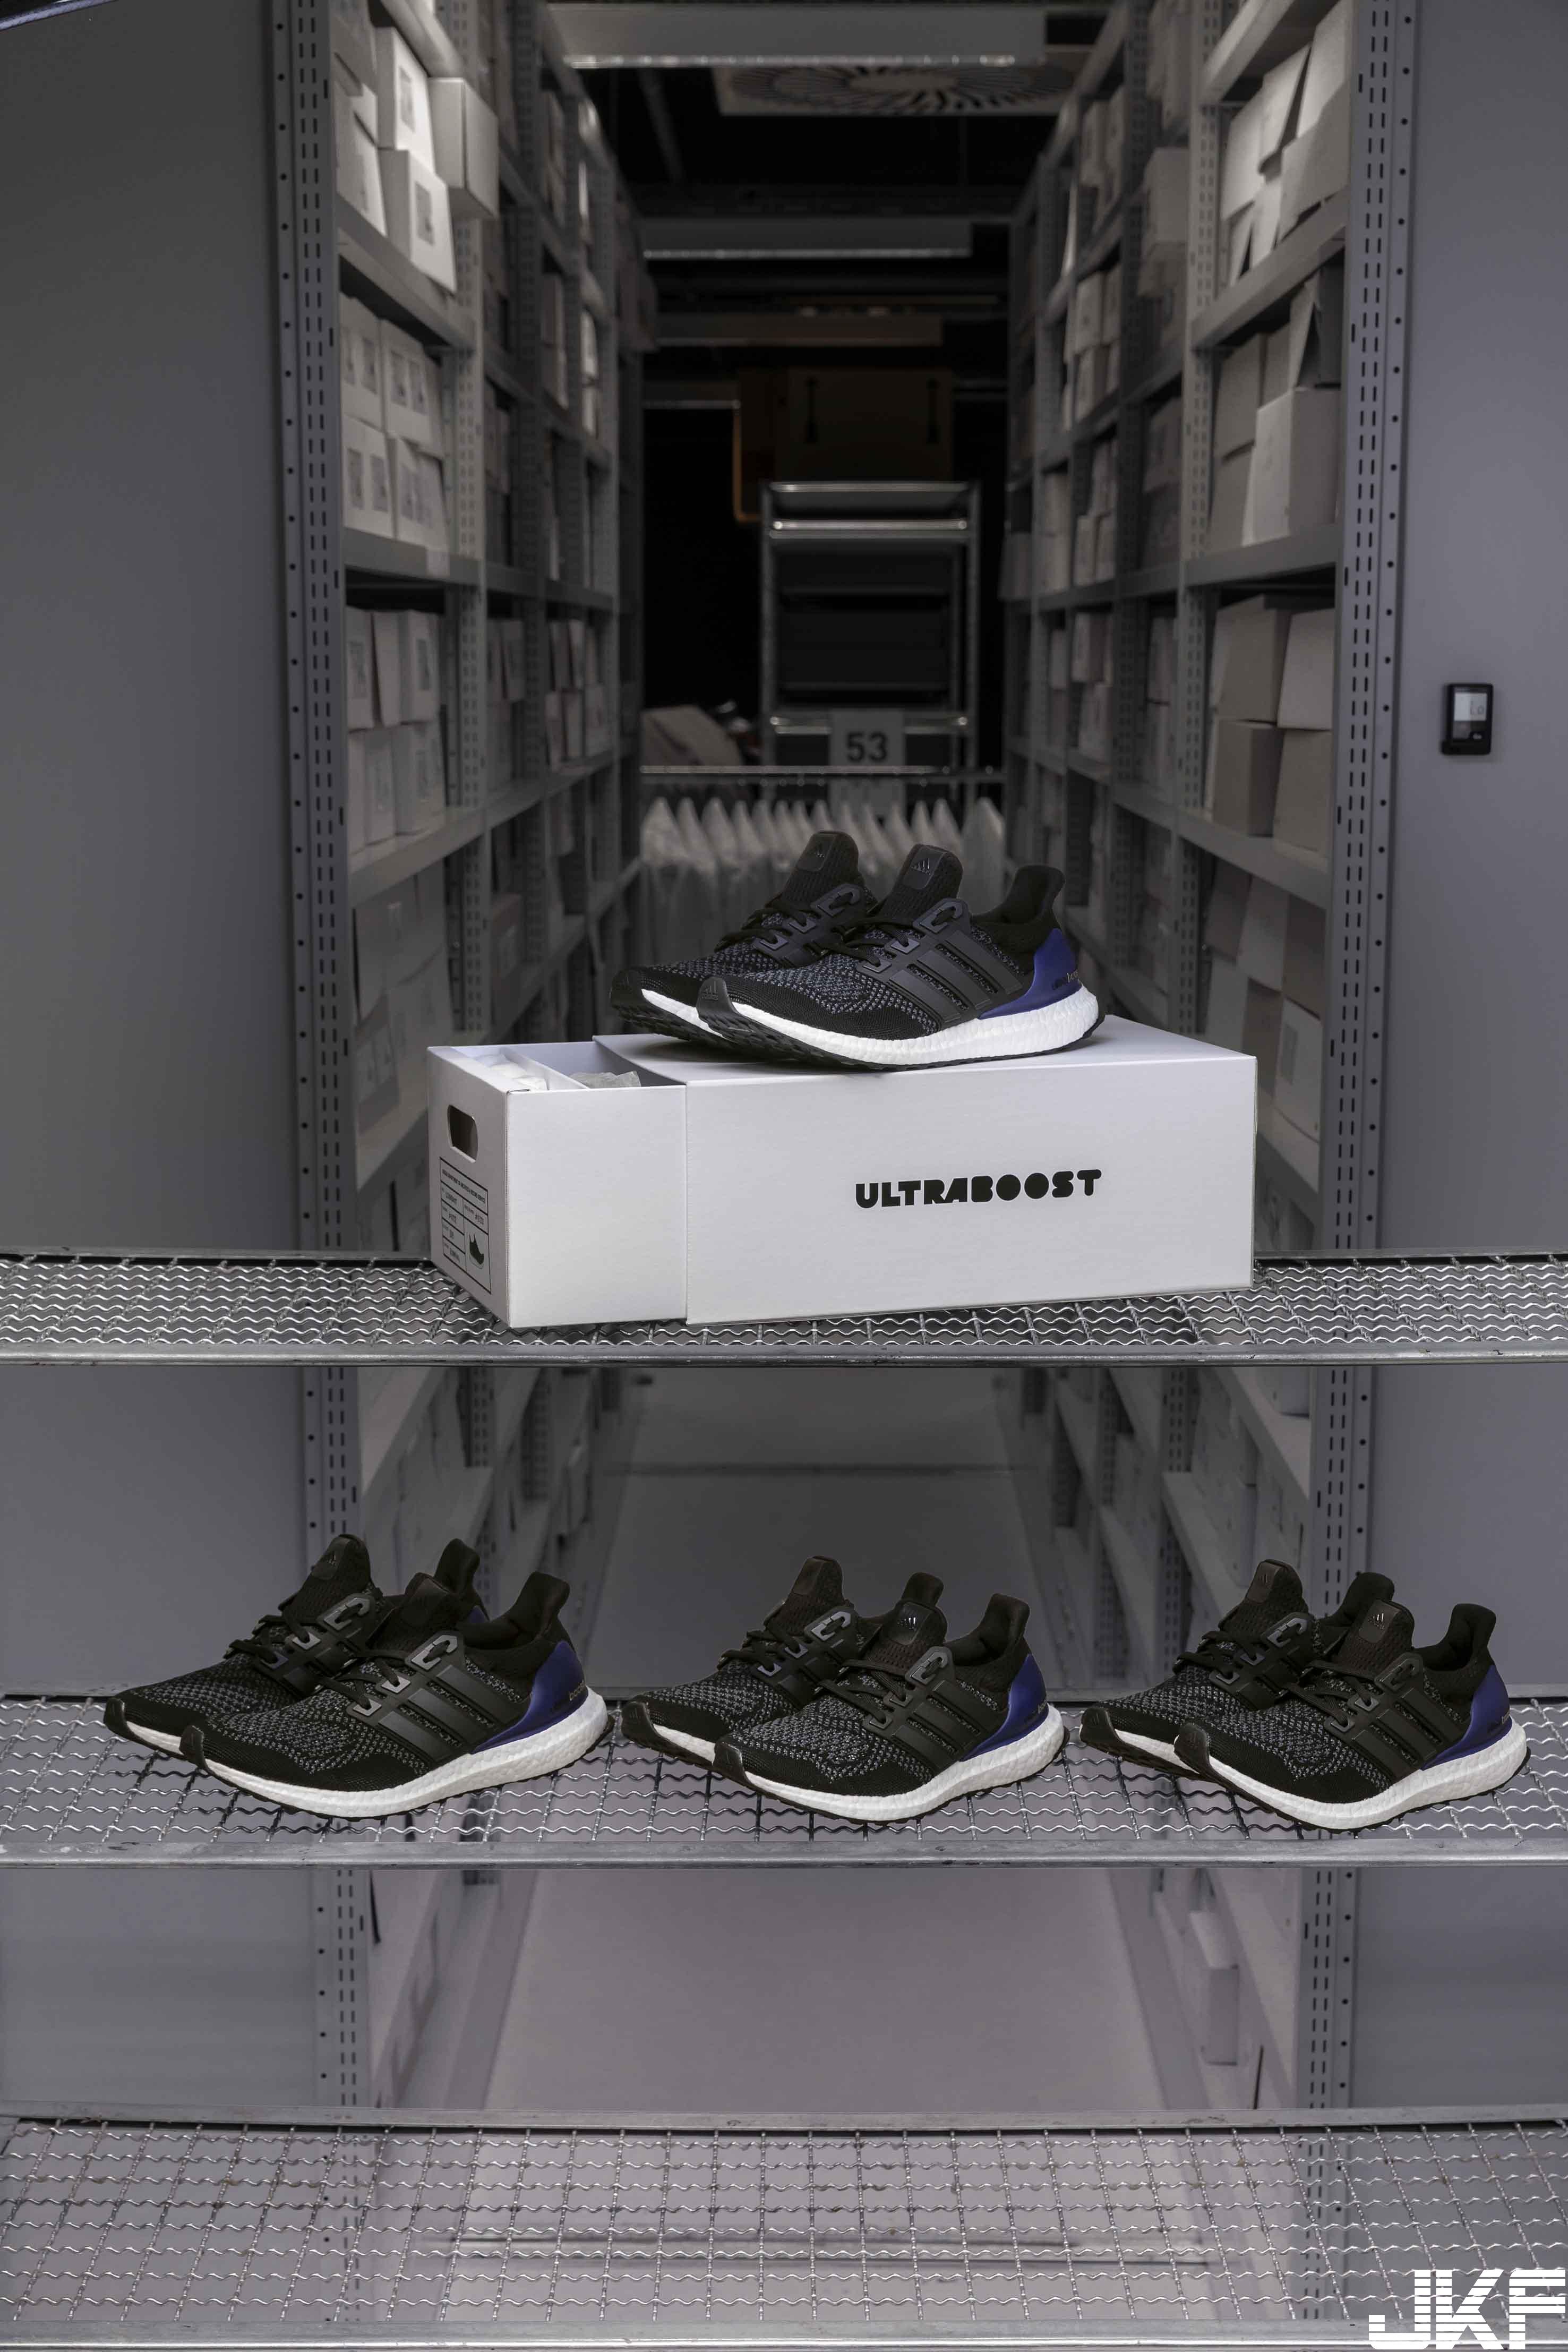 6.UltraBOOST跑鞋完美貼合運動與休閒穿搭需求的設計,成功吸引國內外名人上腳穿搭,搶.jpg